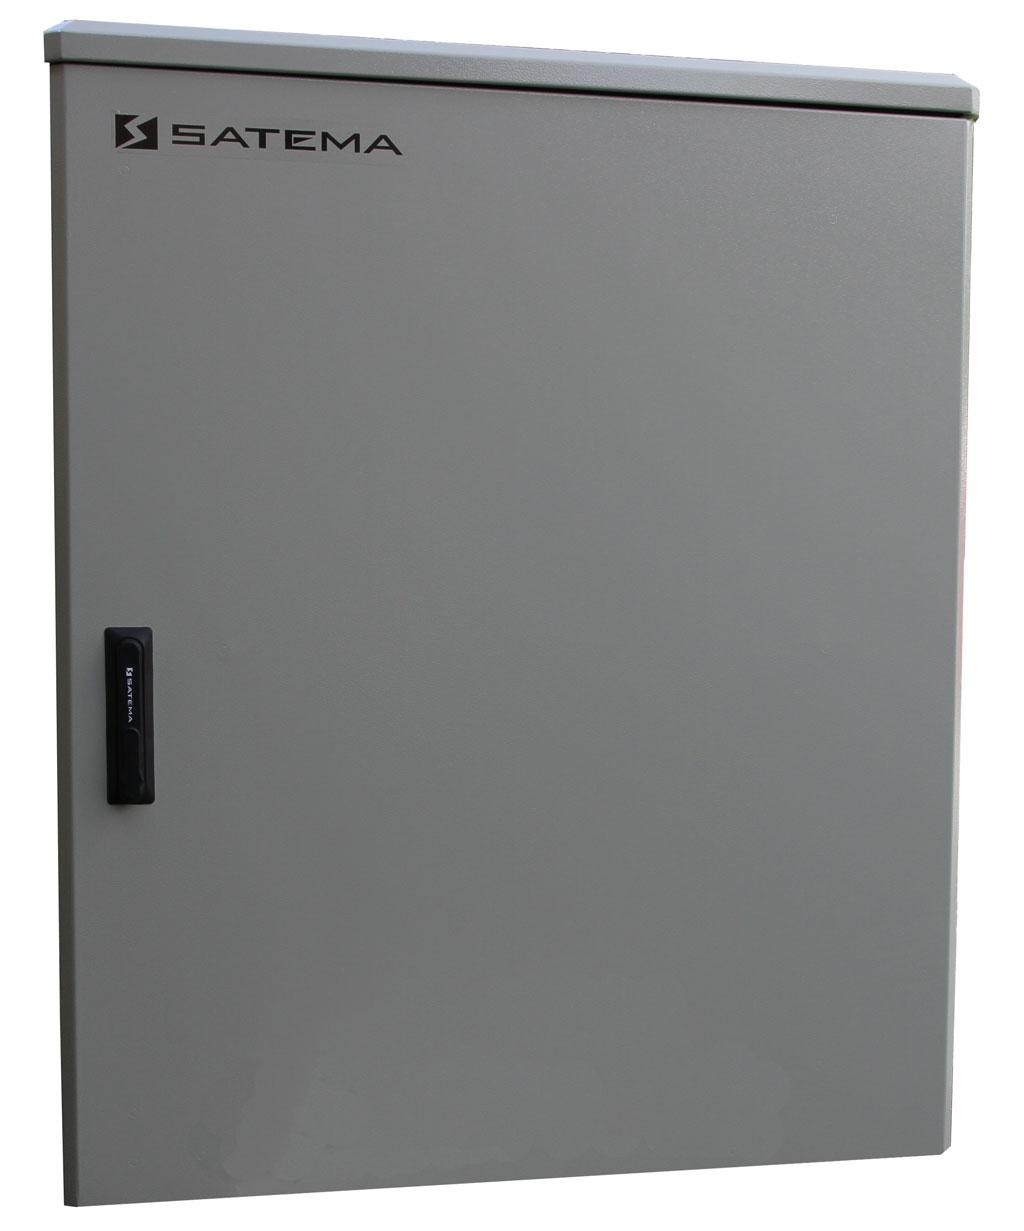 Dubbelvaggiga-Aluminiumskap-1000x1400x400